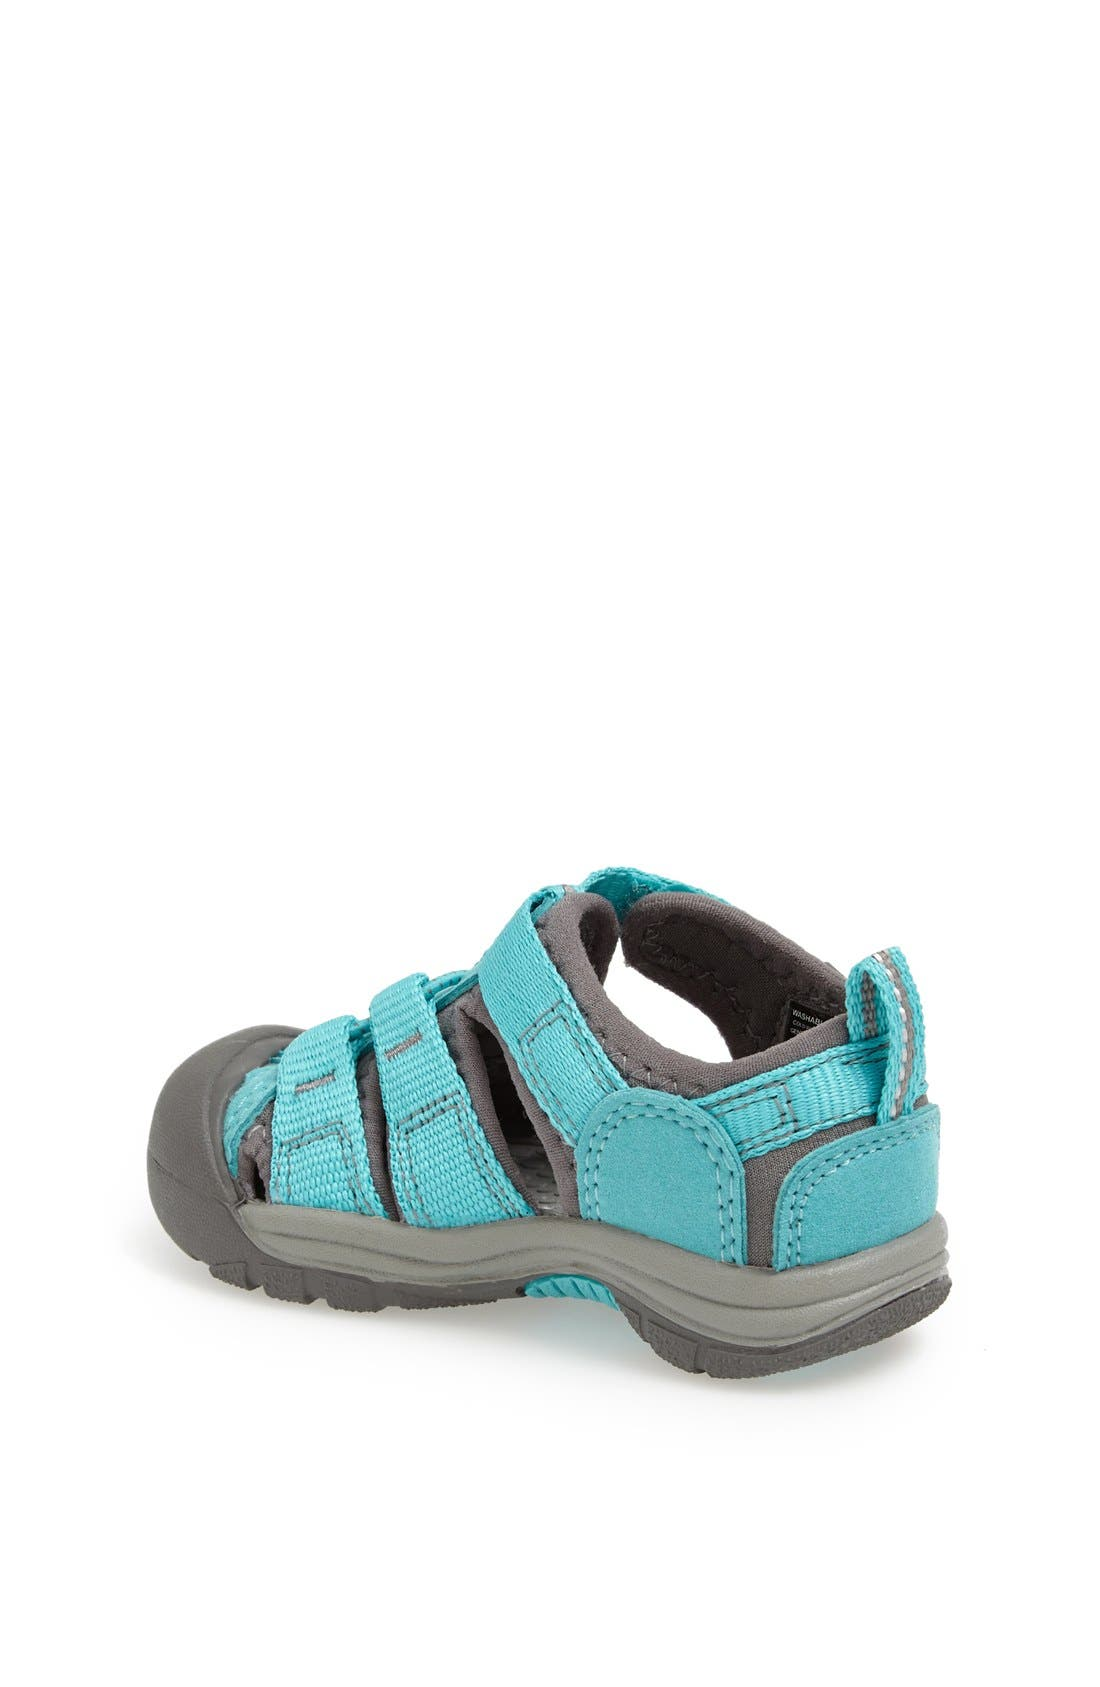 'Newport H2' Water Friendly Sandal,                             Alternate thumbnail 202, color,